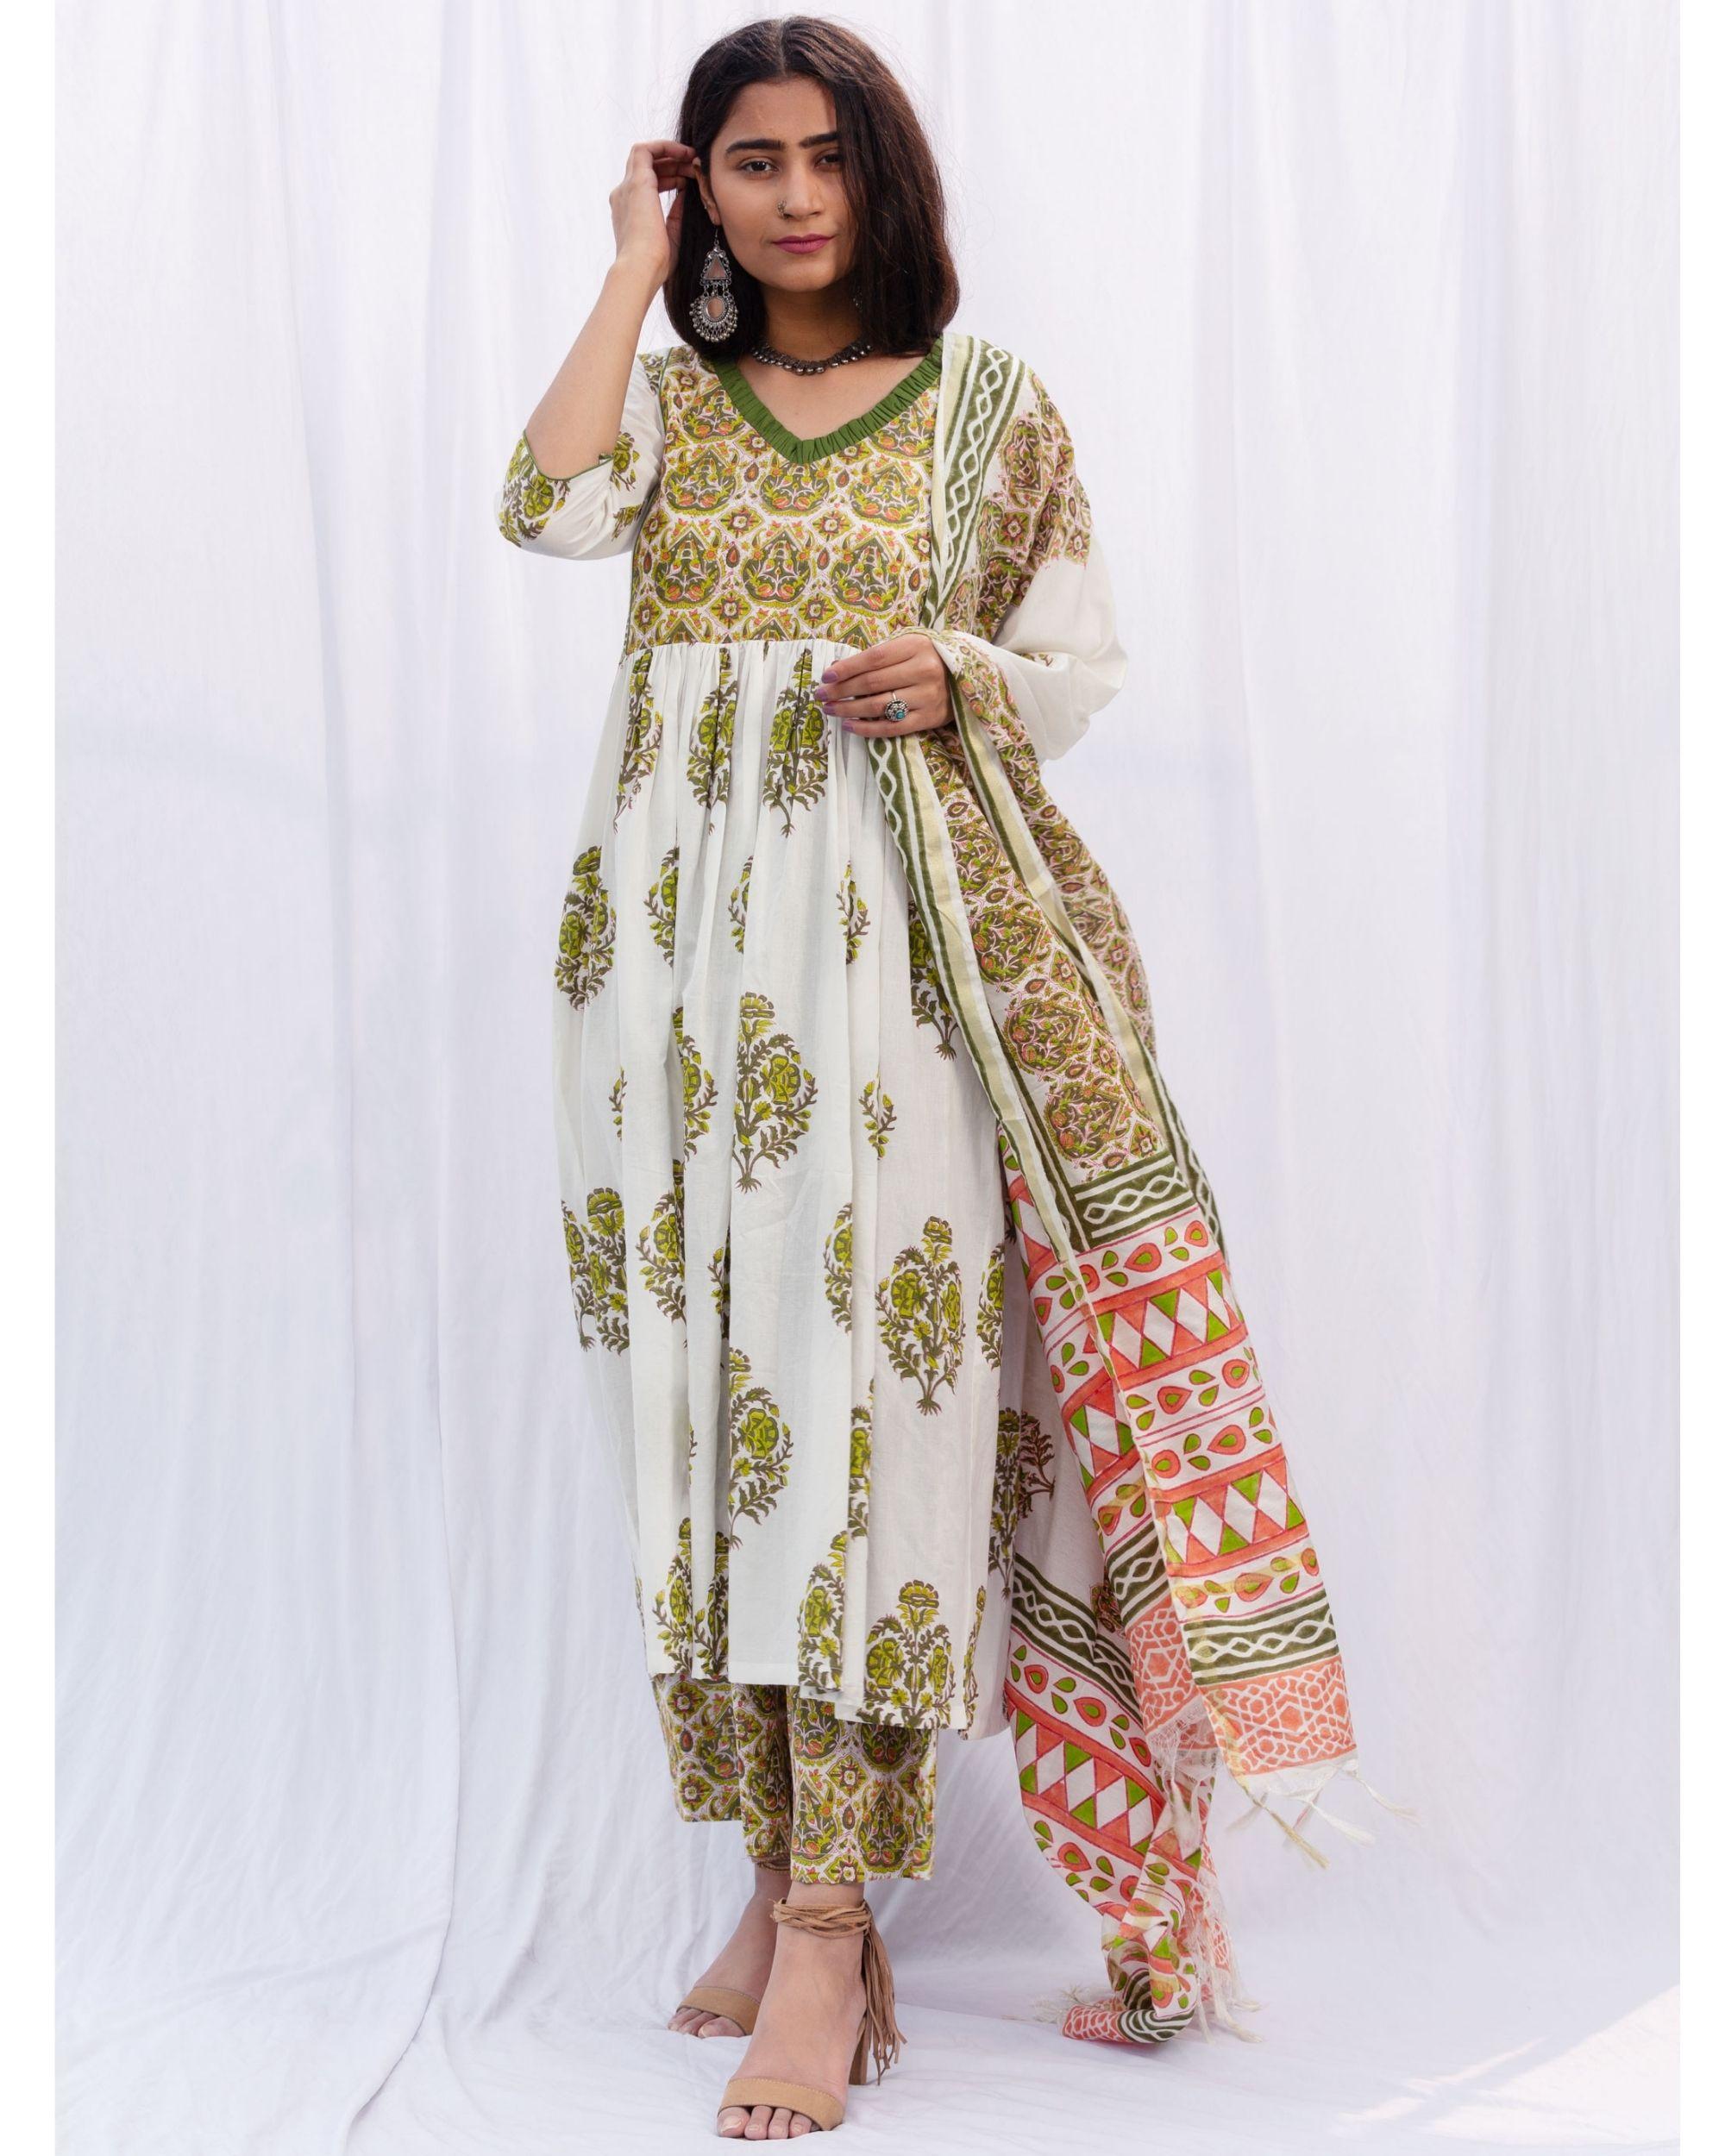 Green jhaalar kurta and jaal hand block printed palazzo with cotton chanderi kota dori duppatta - set of three